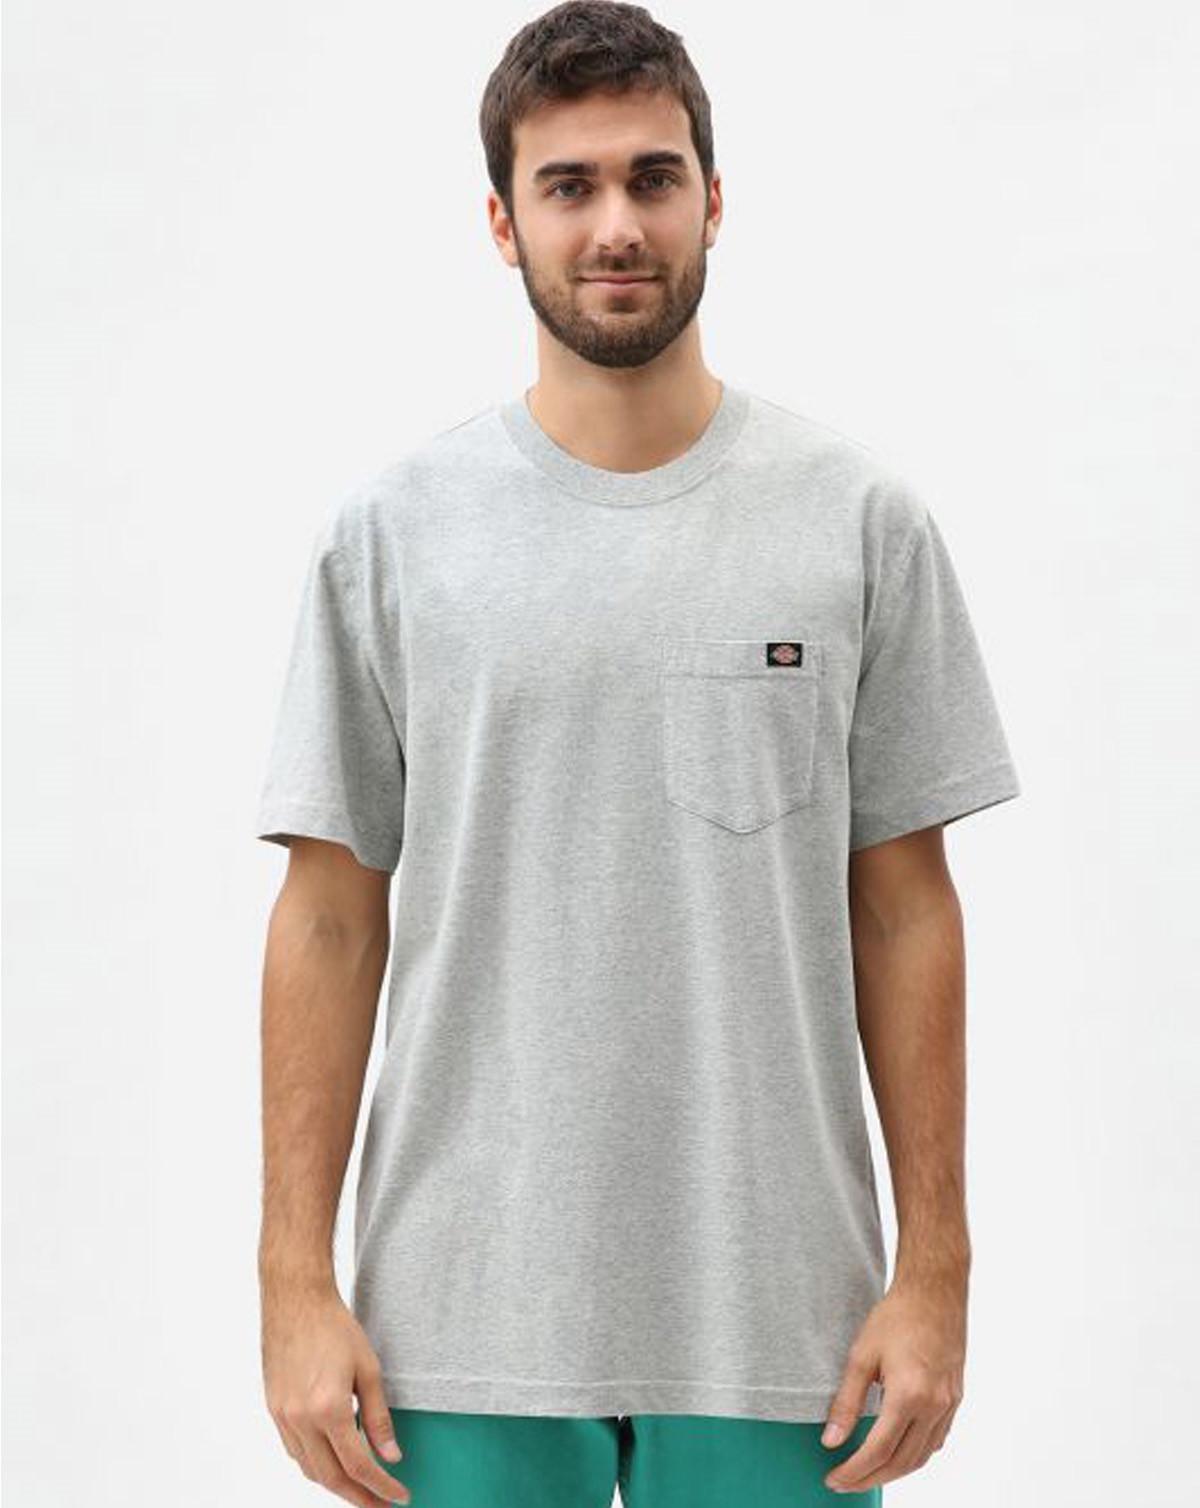 Dickies Porterdale T-shirt (Heather Grey, 2XL)